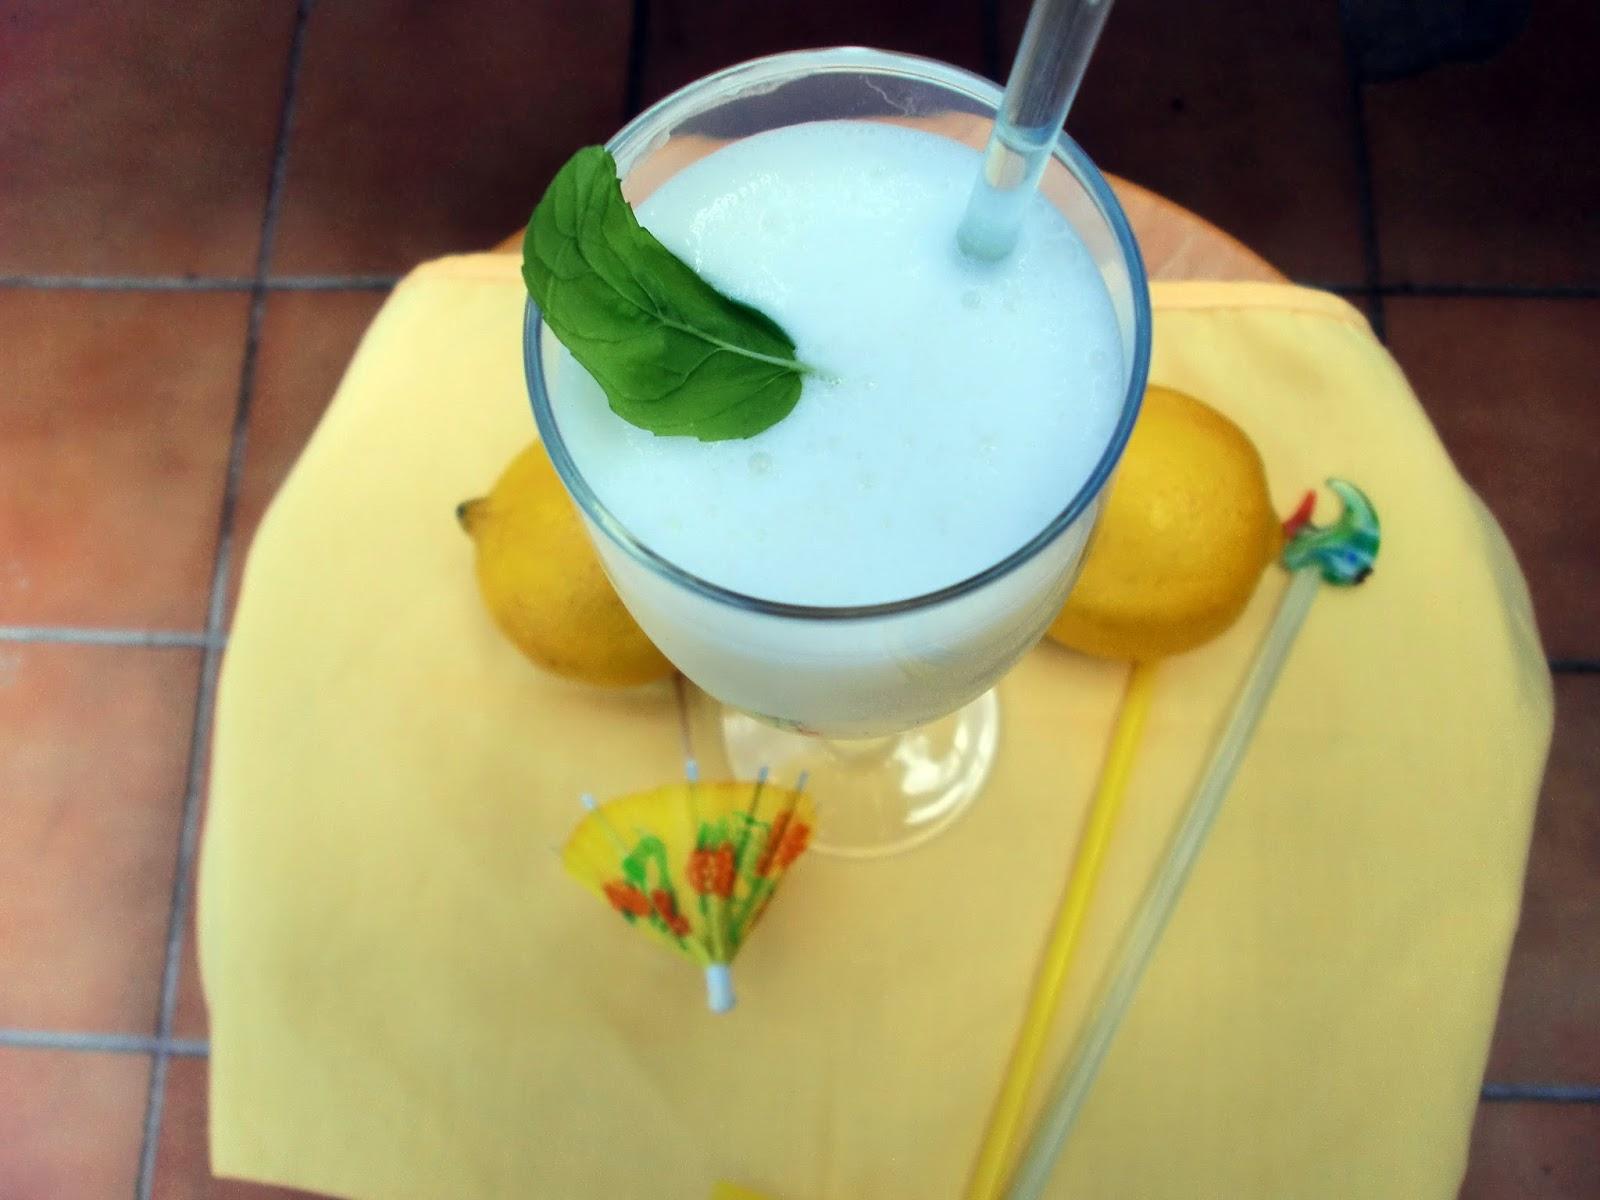 Las tentaciones de nelpi sorbete de lim n al cava - Sorbete limon al cava ...